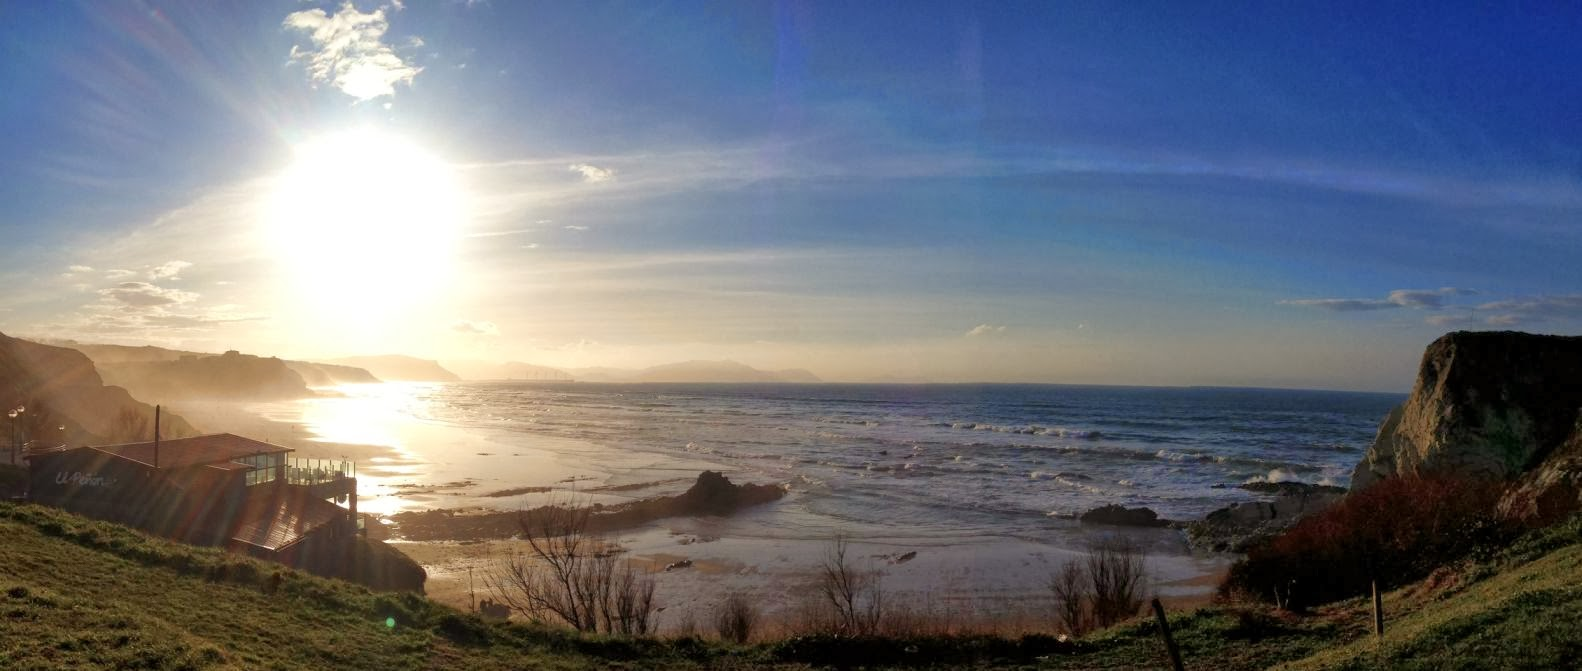 panoramica de la playa de sopelana